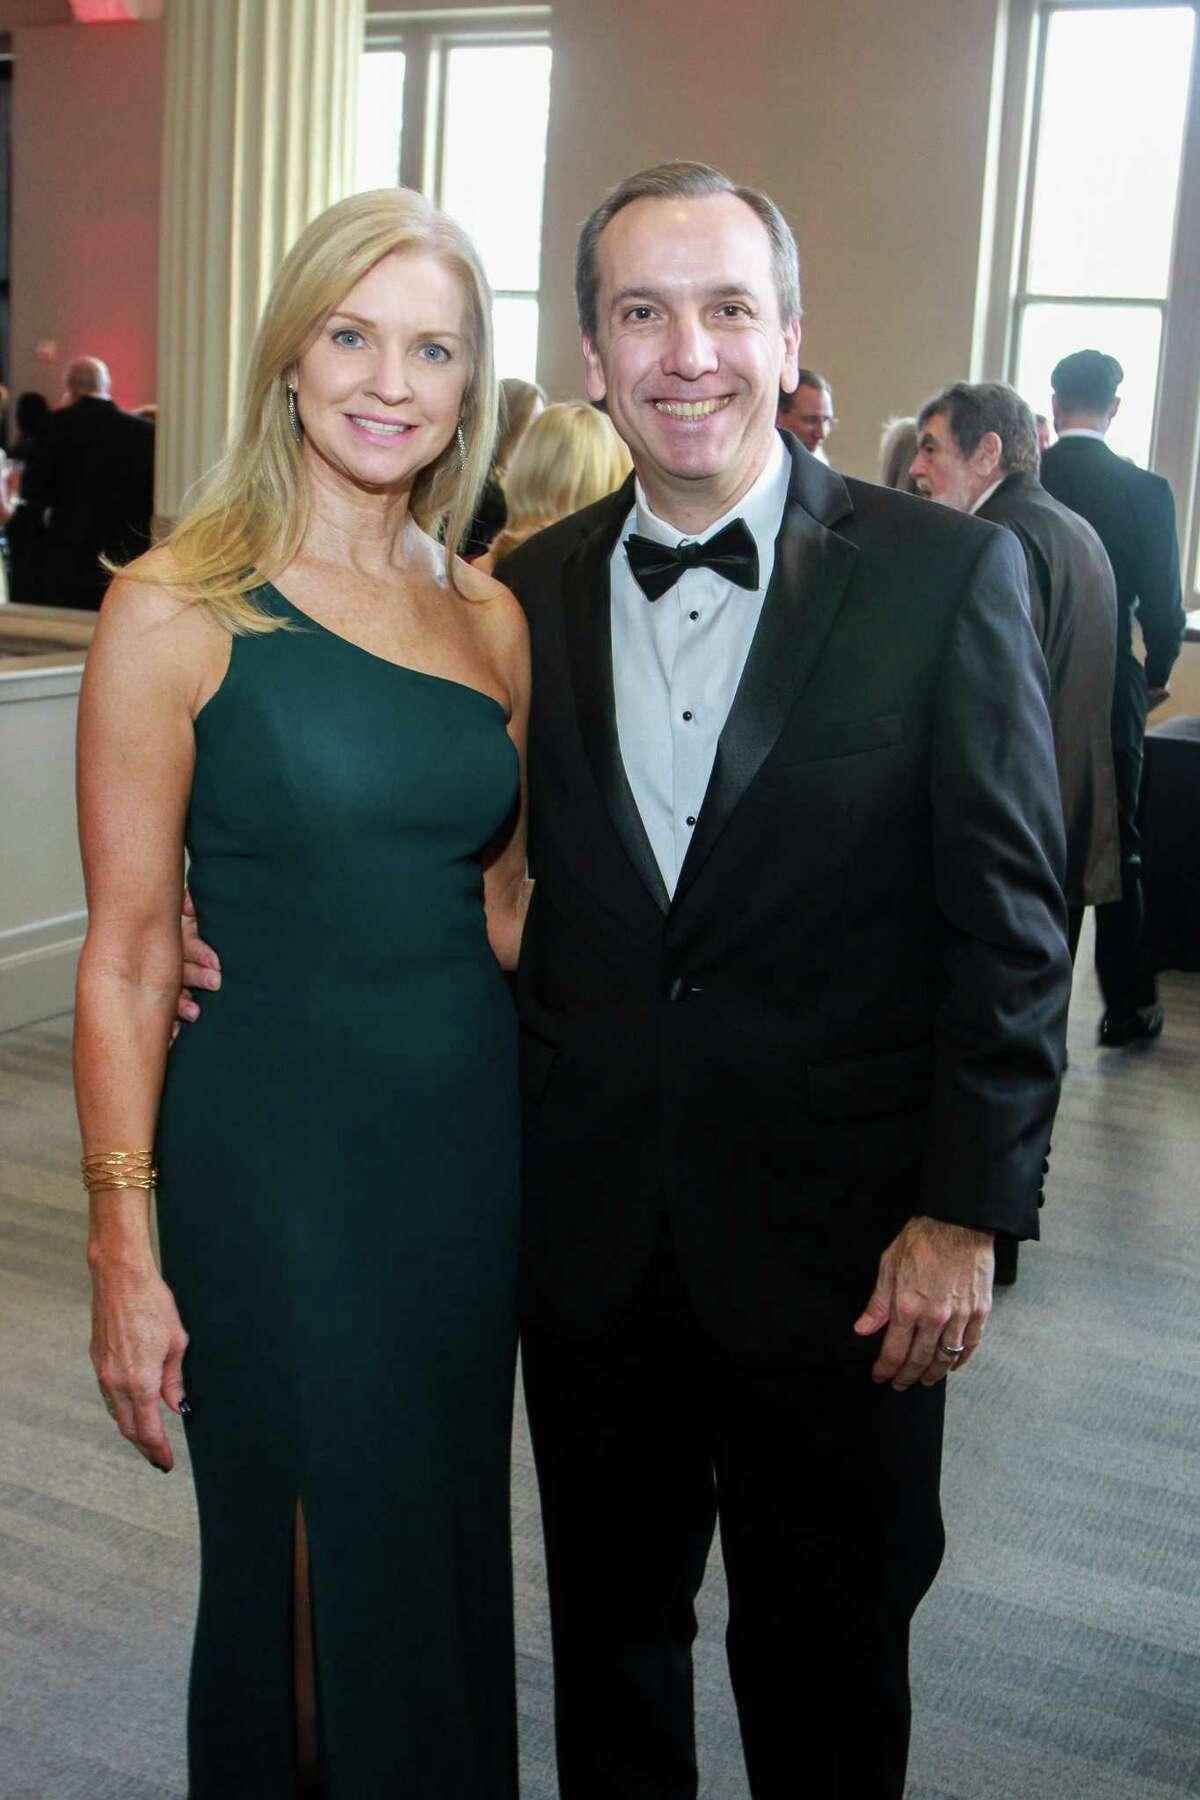 Robin and Juan Trebino at the Corinthian for the Houston Symphony Opening Night Concert & Gala.